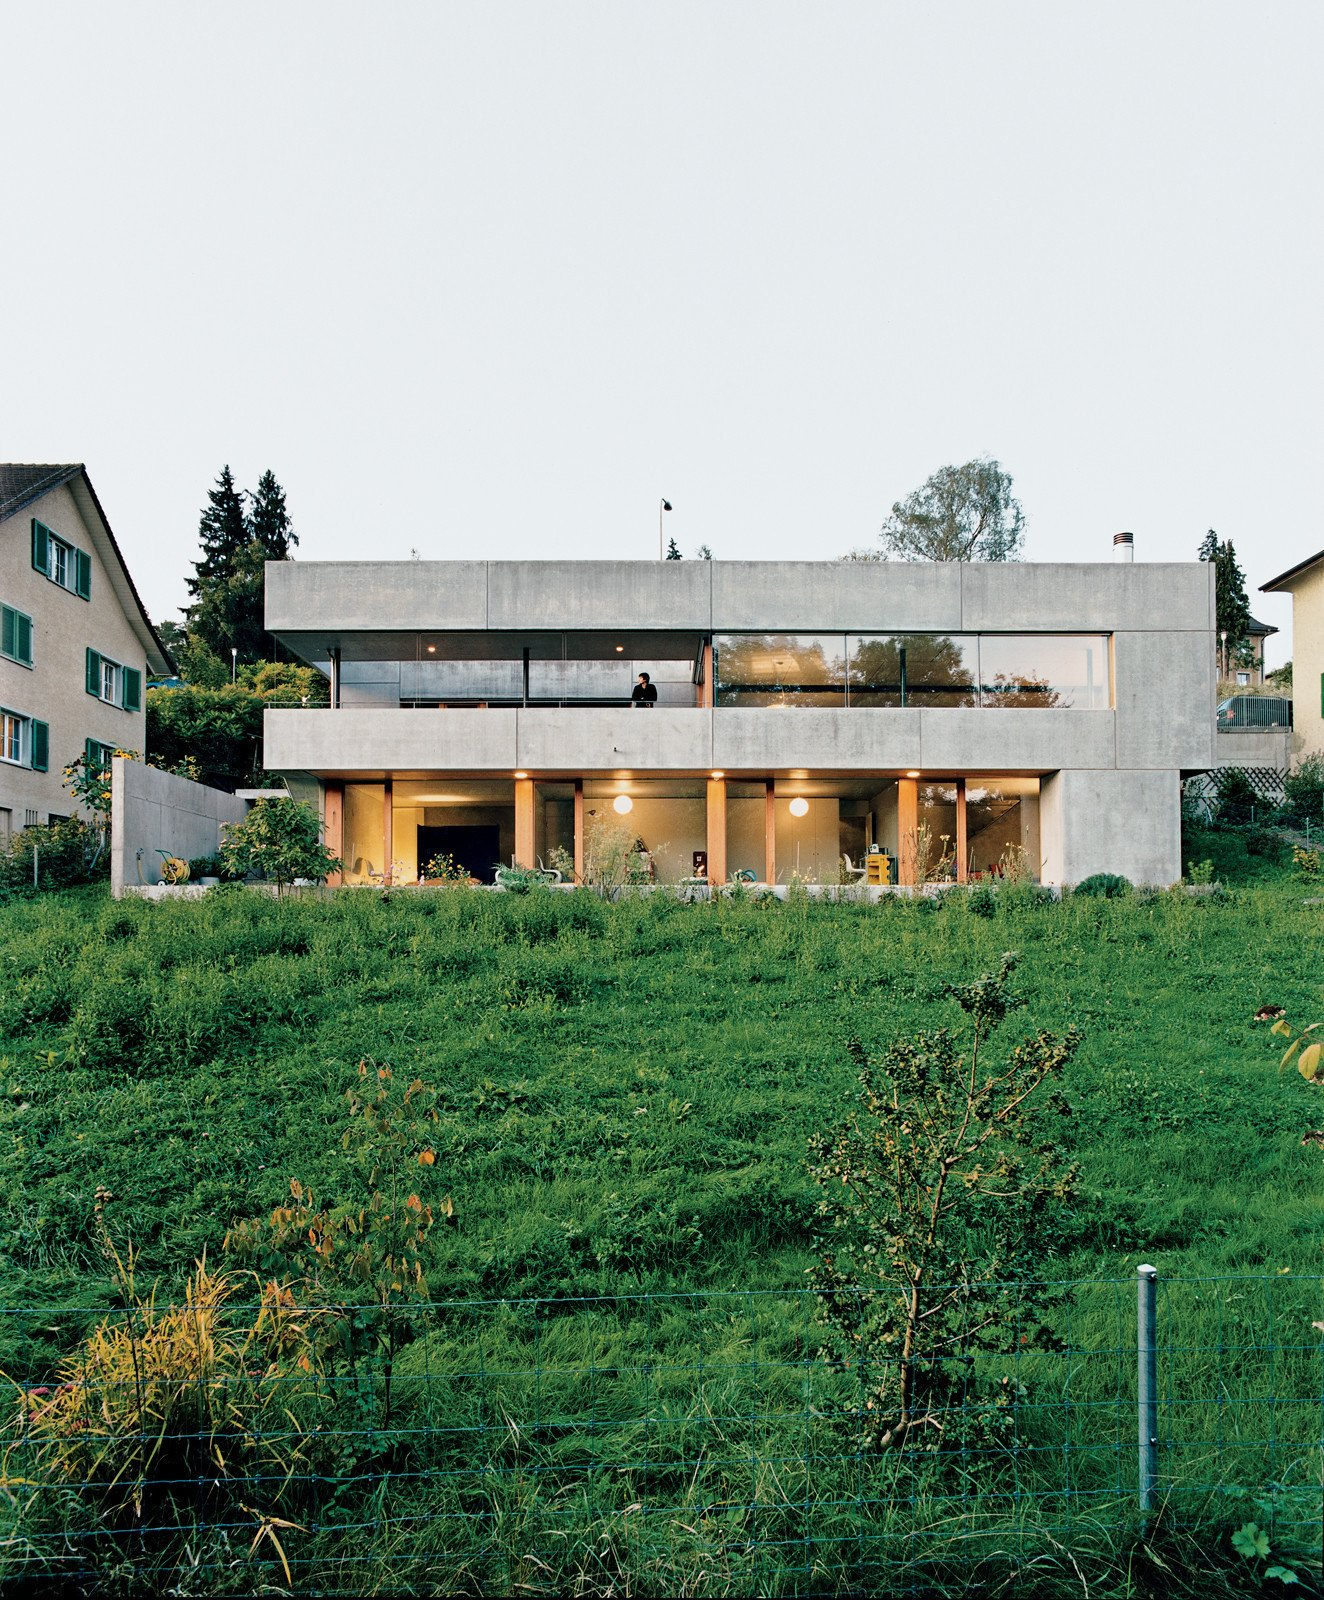 Photo 1 of 11 in Material Spotlight: 10 Killer Concrete Homes